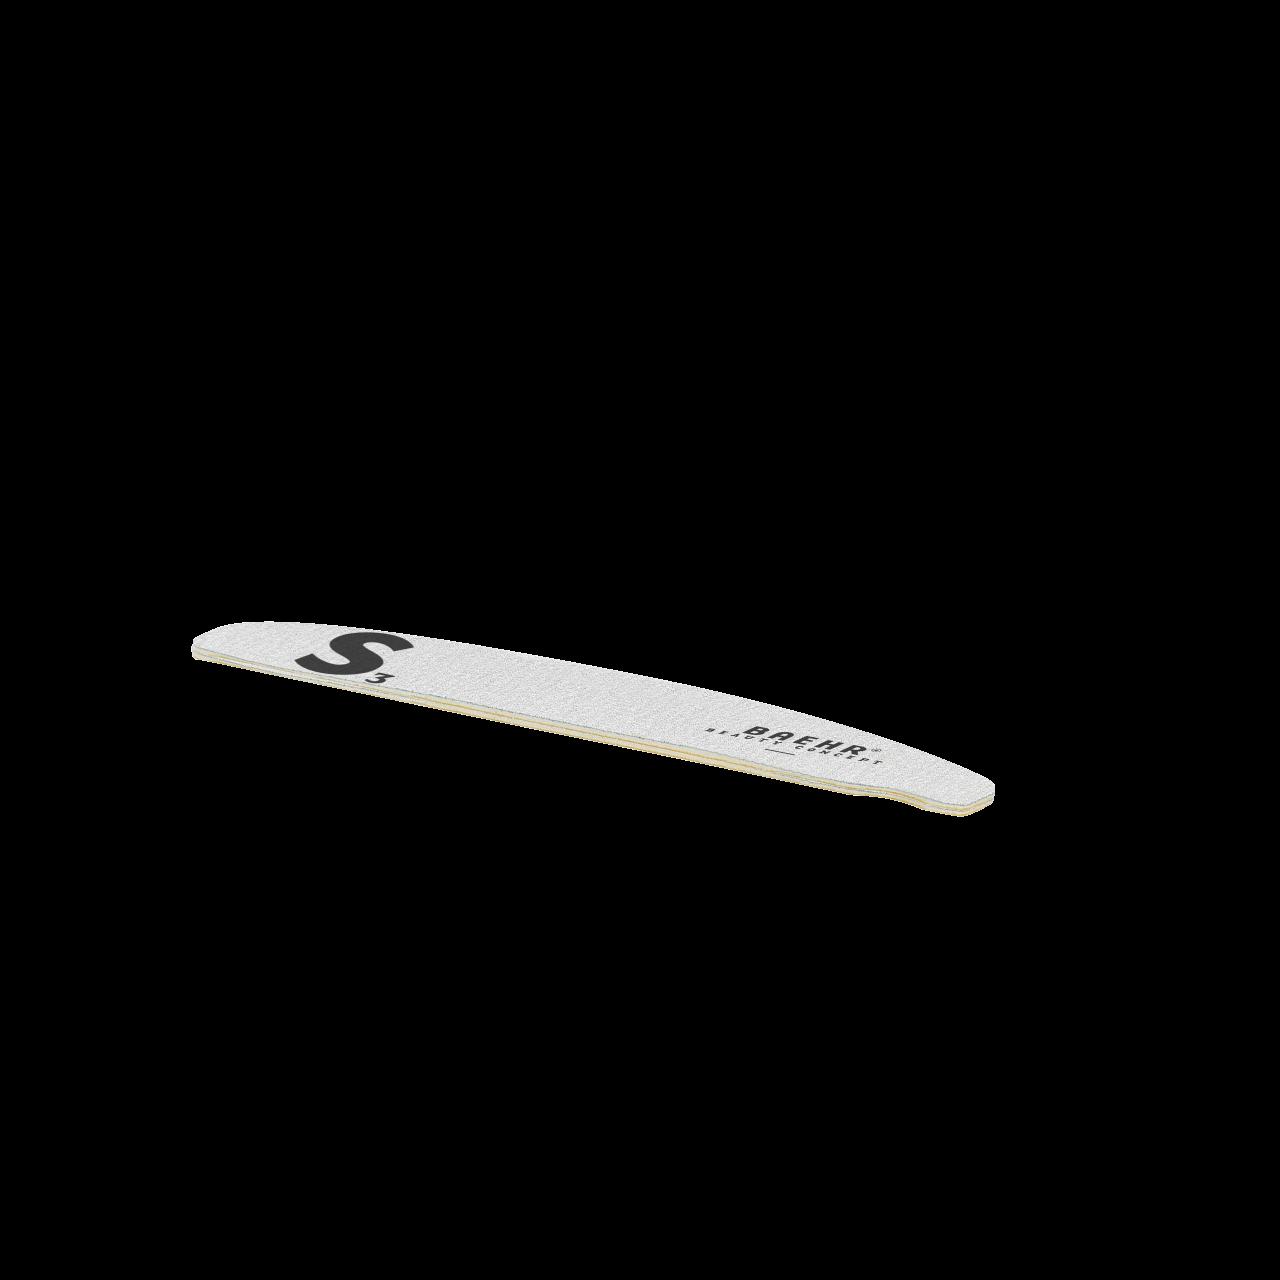 Feilblätter zu Kunststoff-Bowfeile (20 Stück), Körnung 180, Modell: S 3